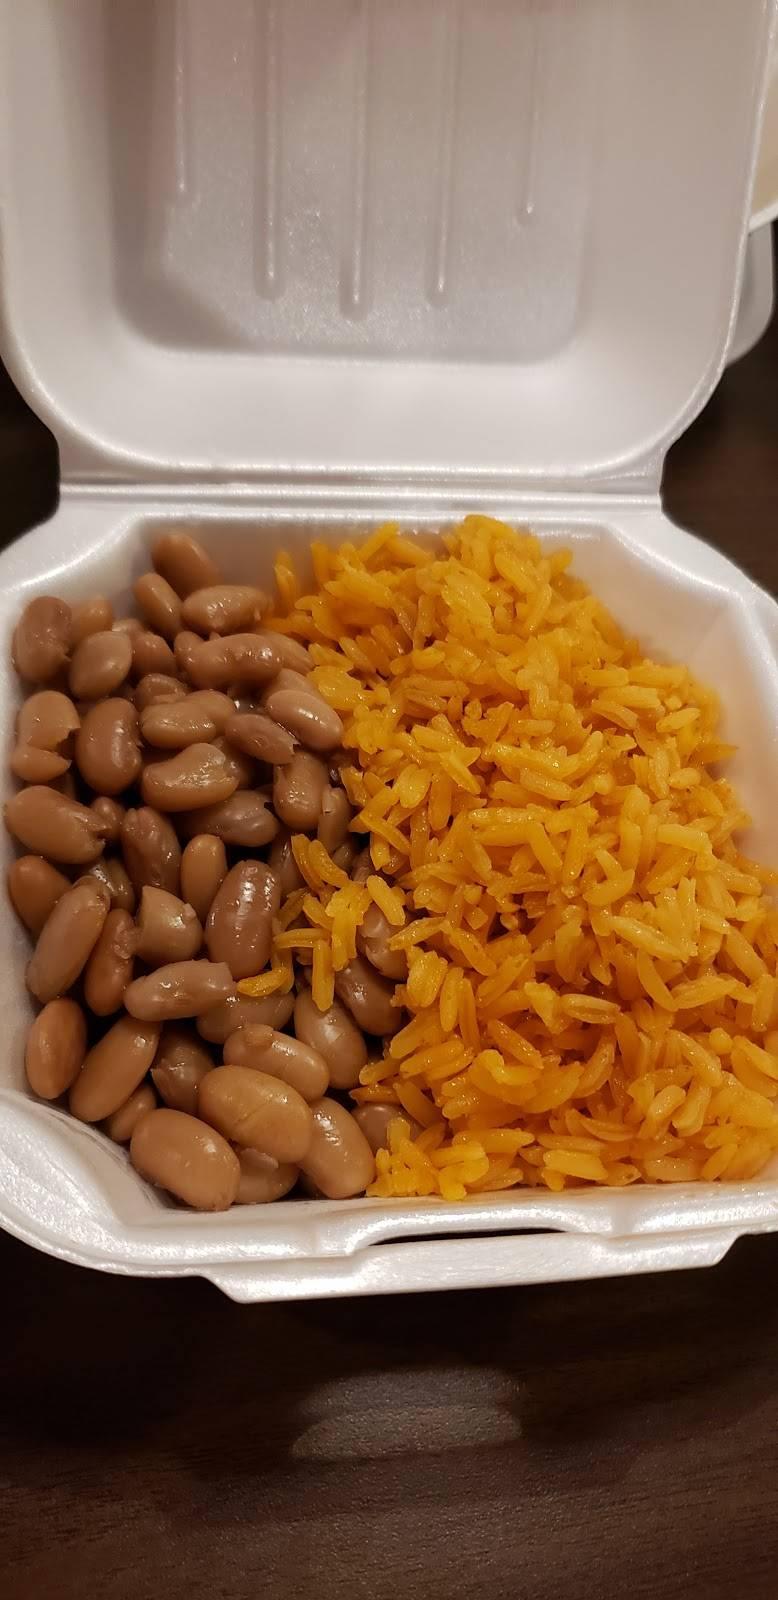 Flacos Tacos 4   restaurant   744 Oglethorpe Hwy, Hinesville, GA 31313, USA   9123321310 OR +1 912-332-1310